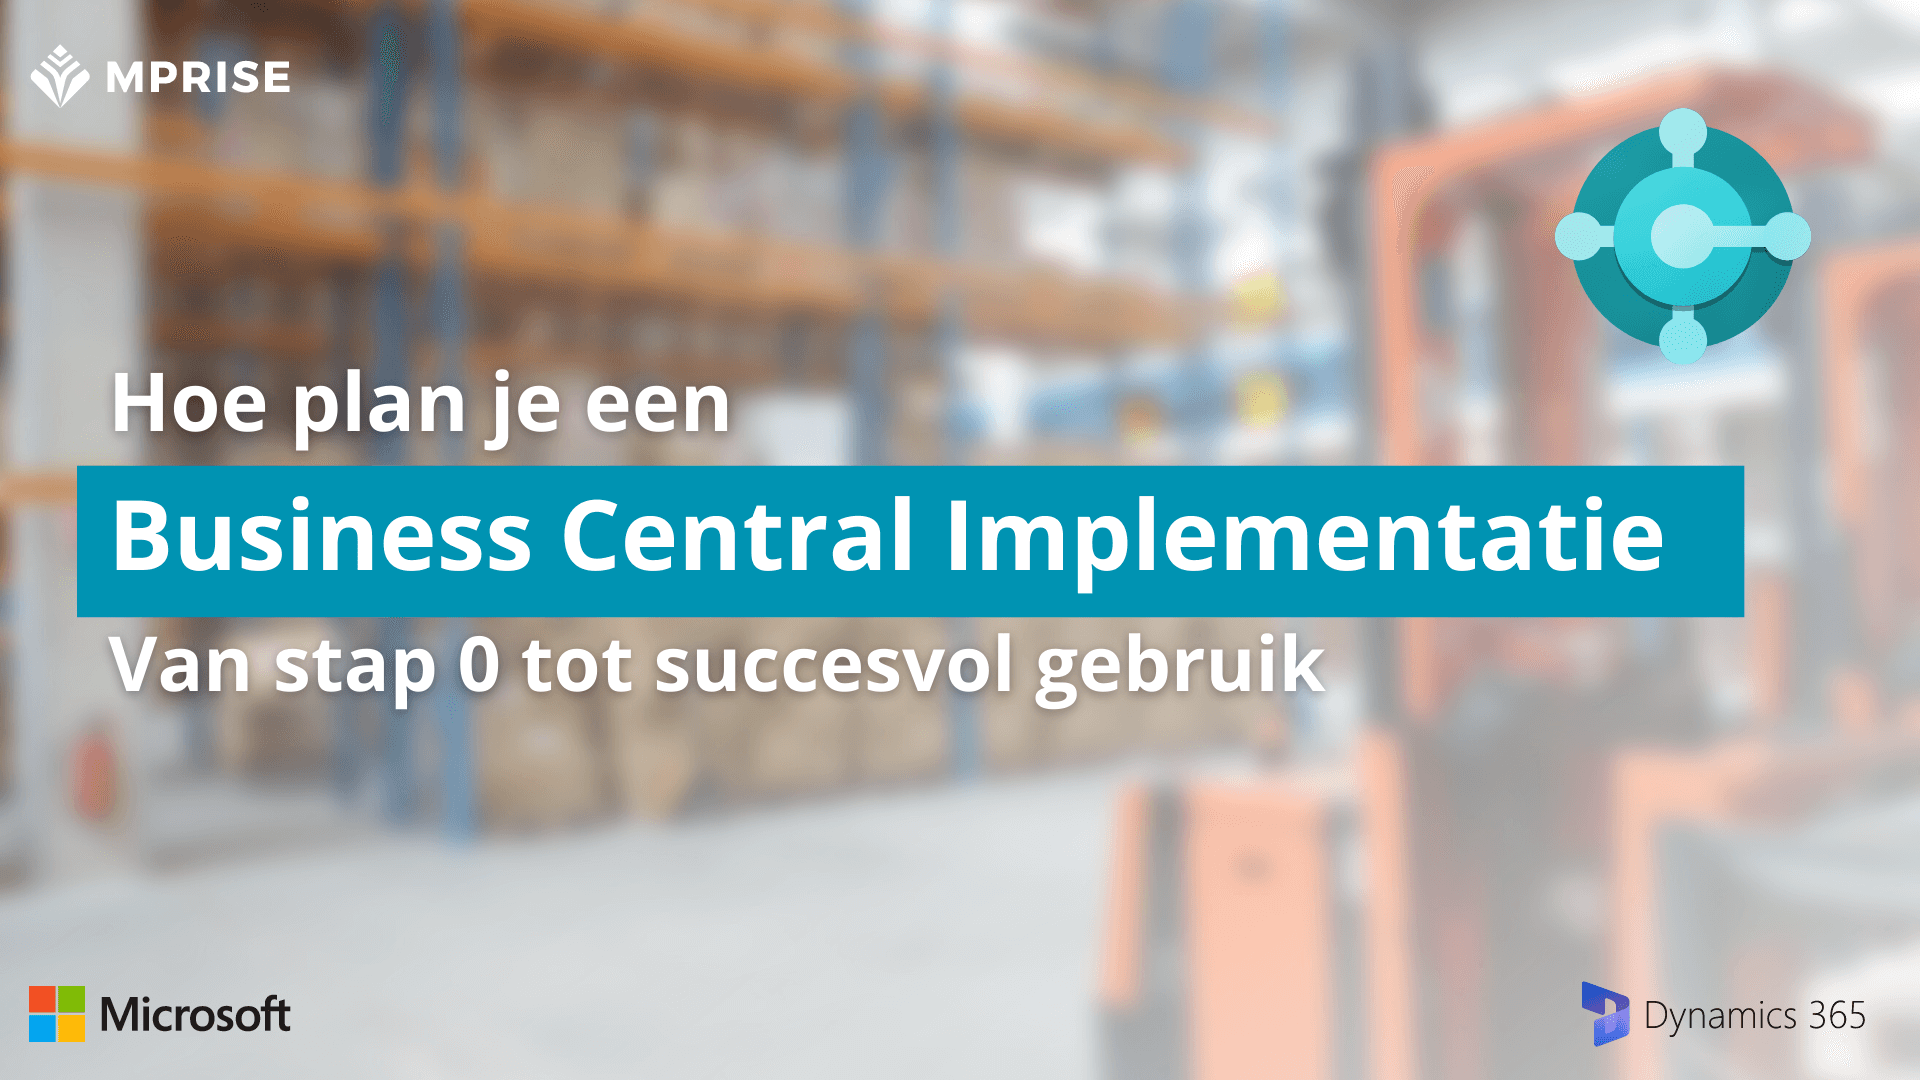 Hoe plan je een Microsoft Dynamics 365 Business Central implementatie